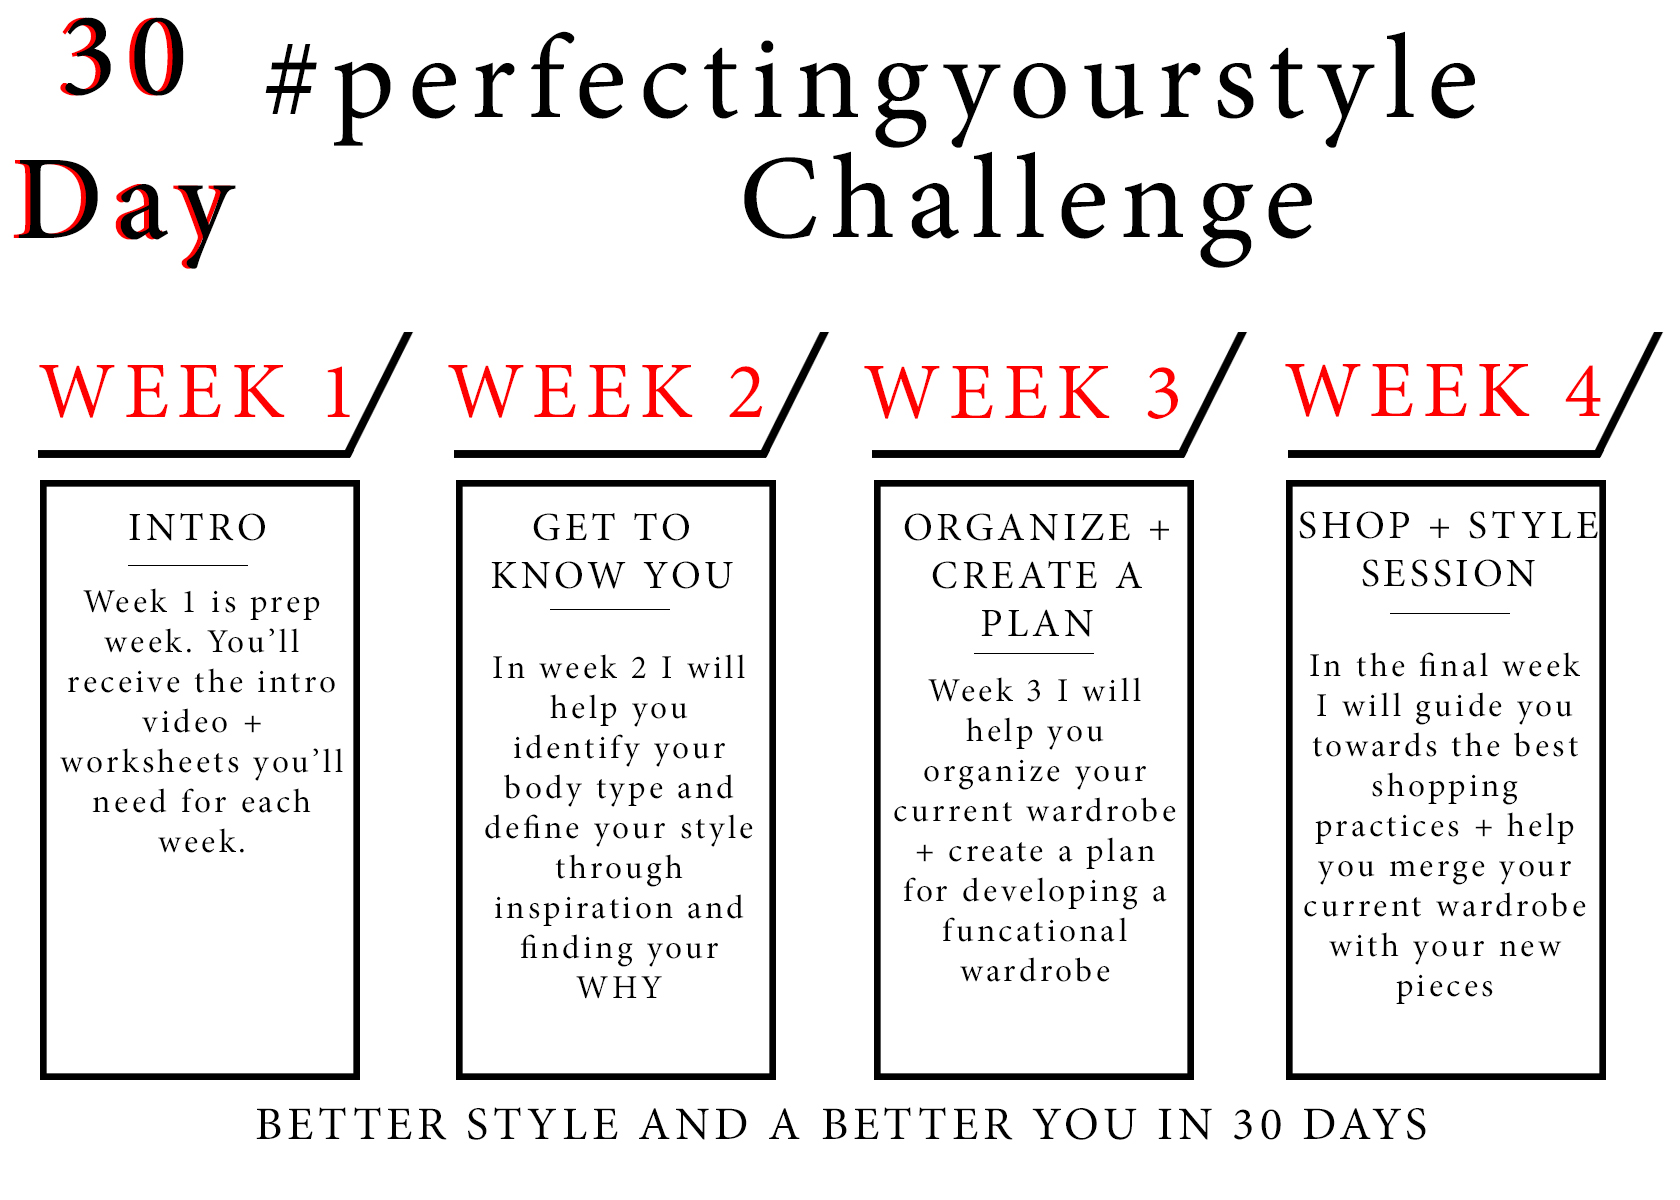 sam-c-perry-perfecting-my-style-challenge-image.jpg